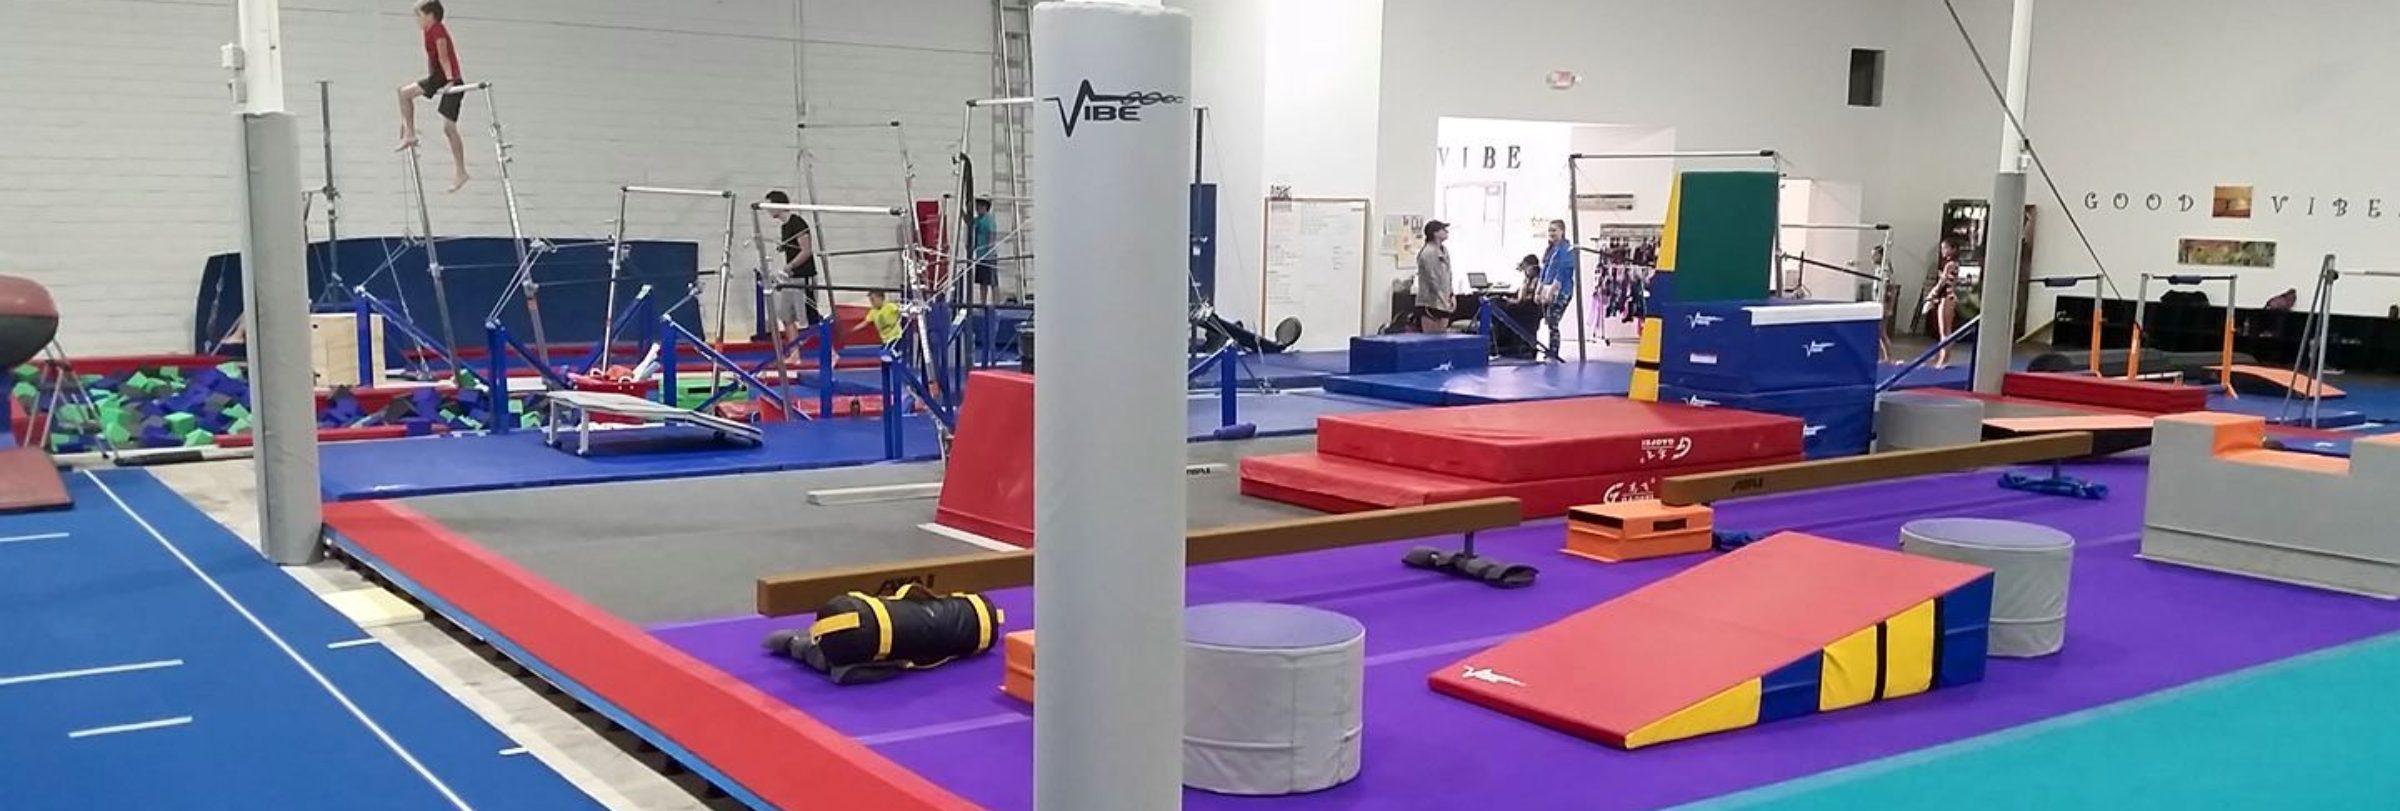 Vibe Gymnastics | Orange, California